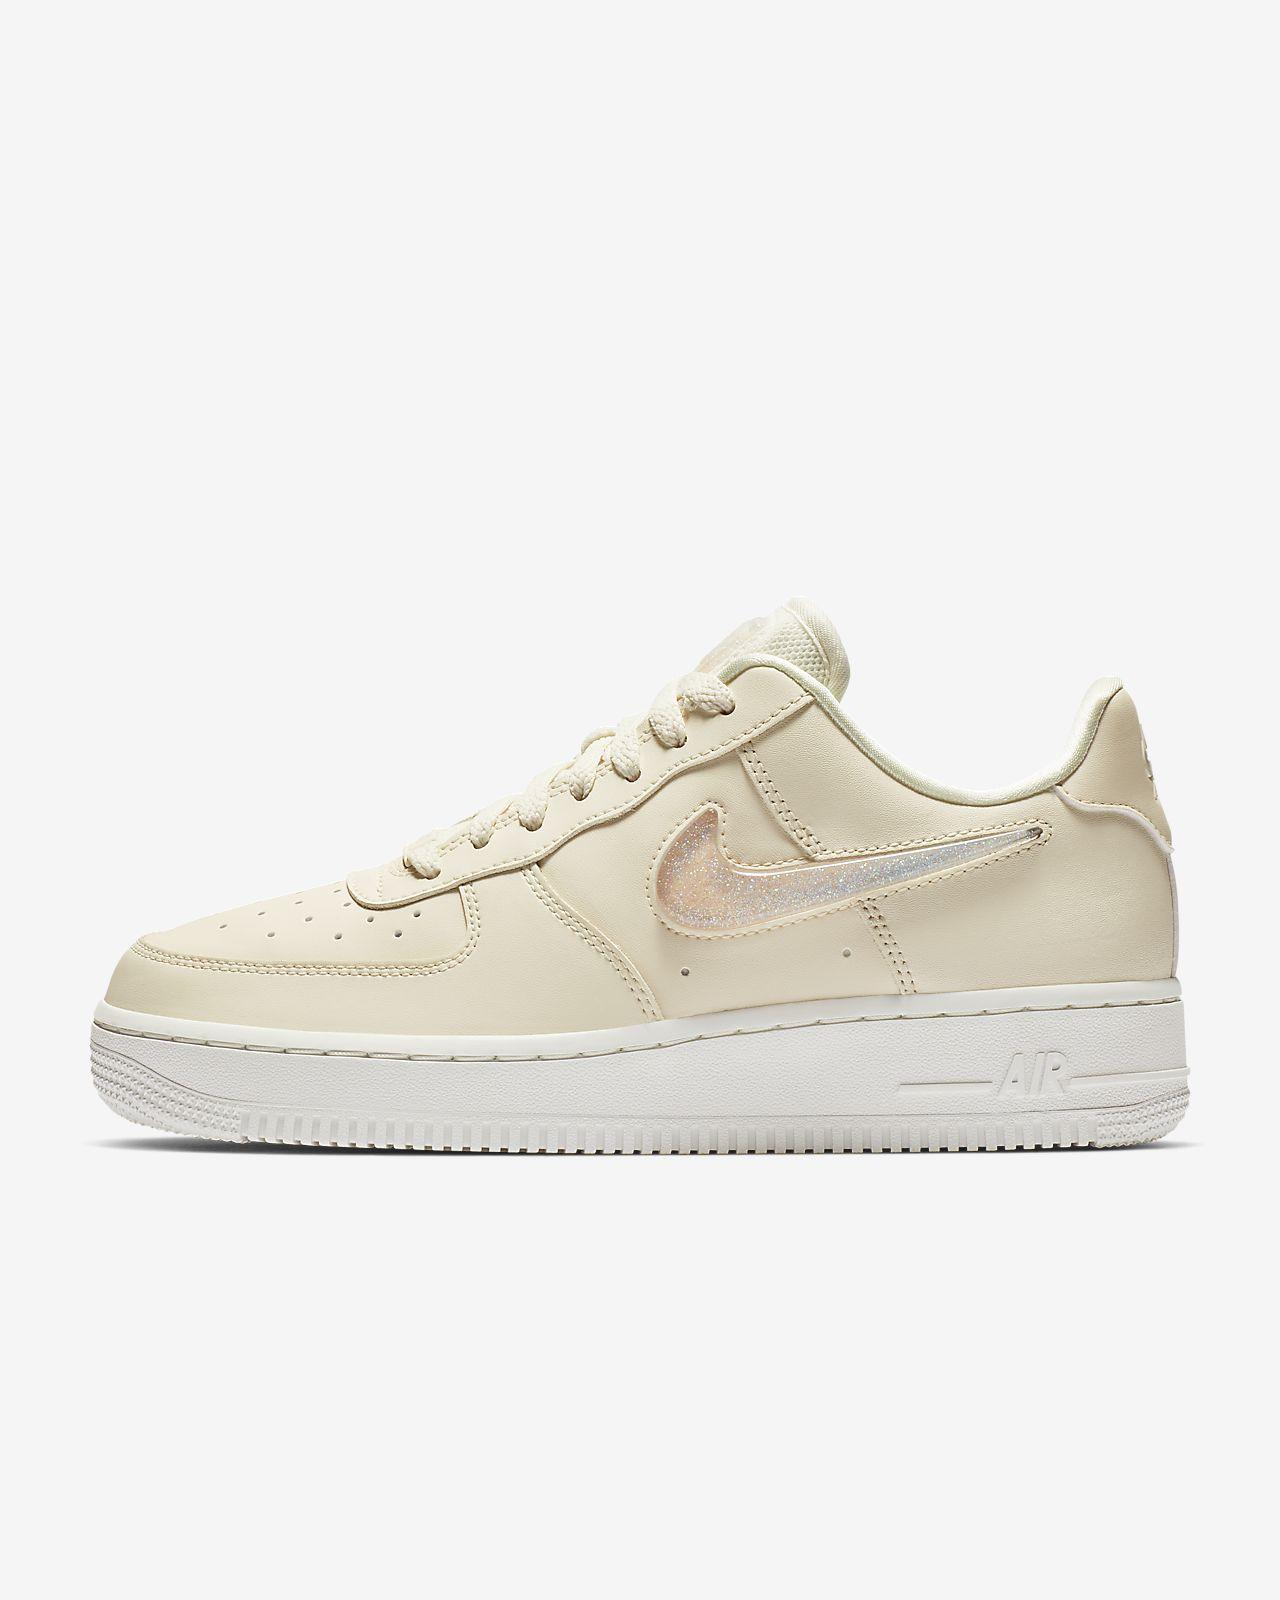 Nike Premium Force Damenschuh '07 De Air 1 Se qA1qvU7